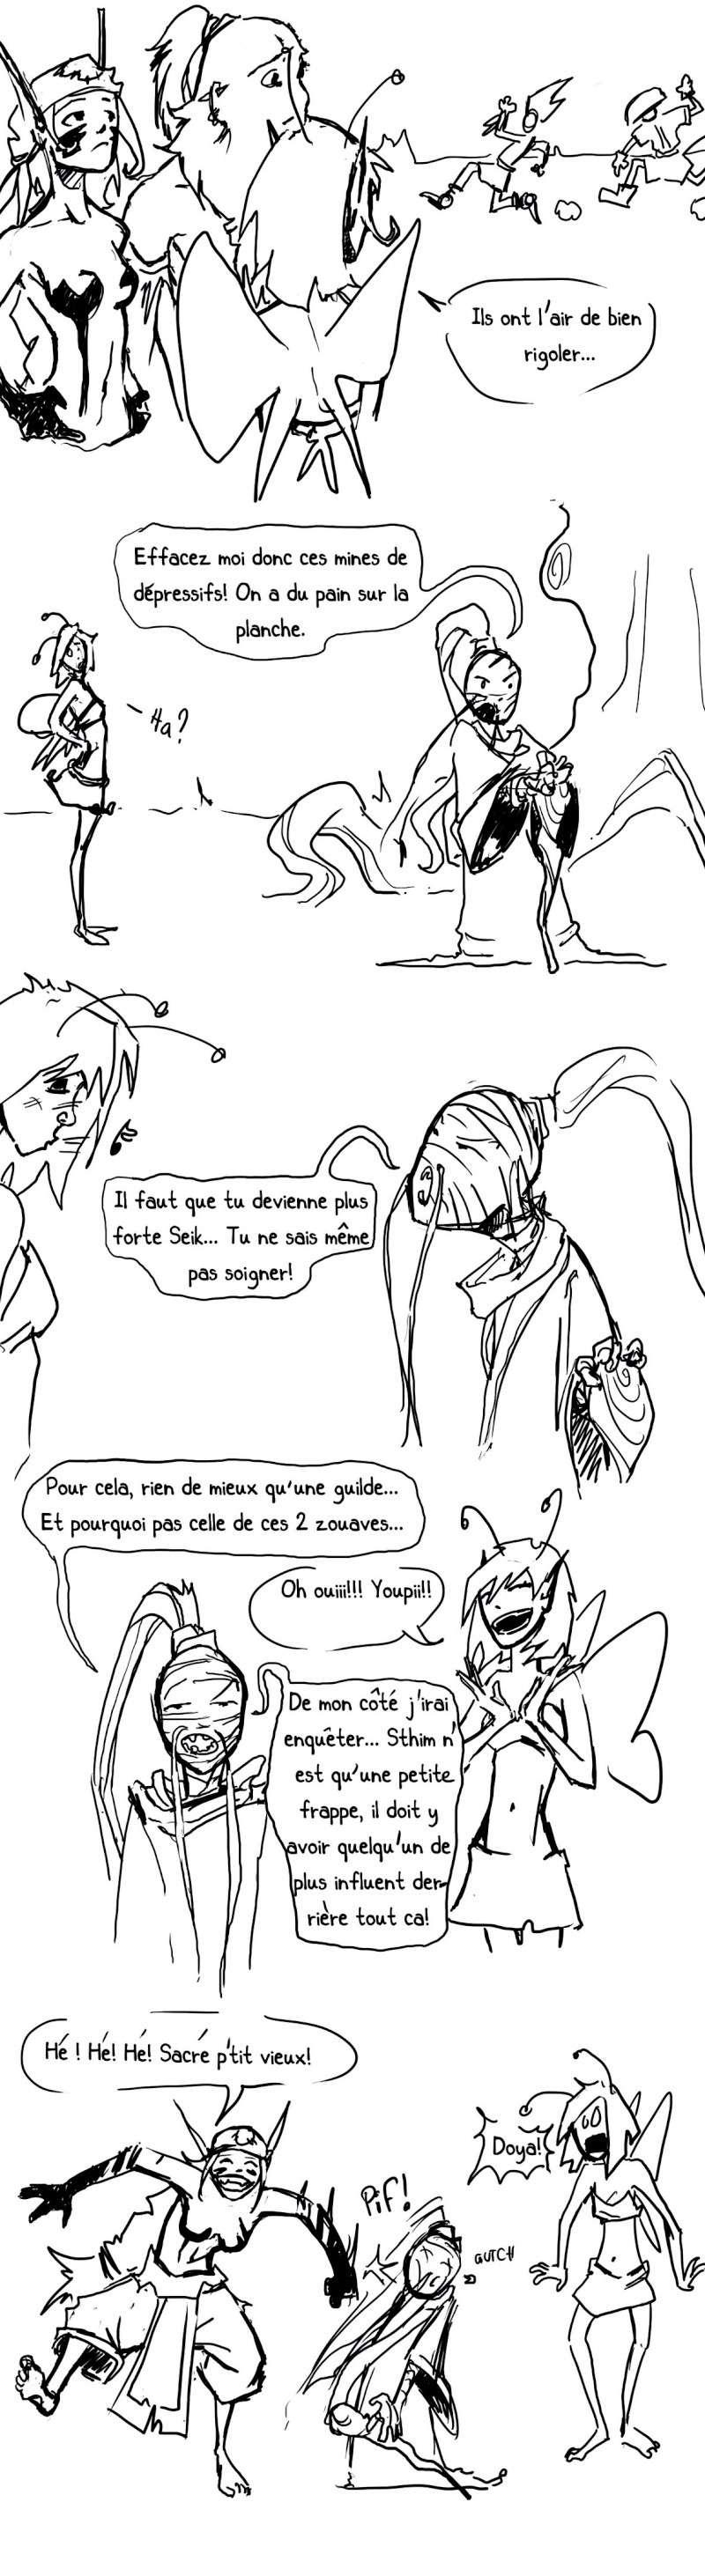 seik et ekis, les aventures ILLUSTREES - Page 2 Strip310